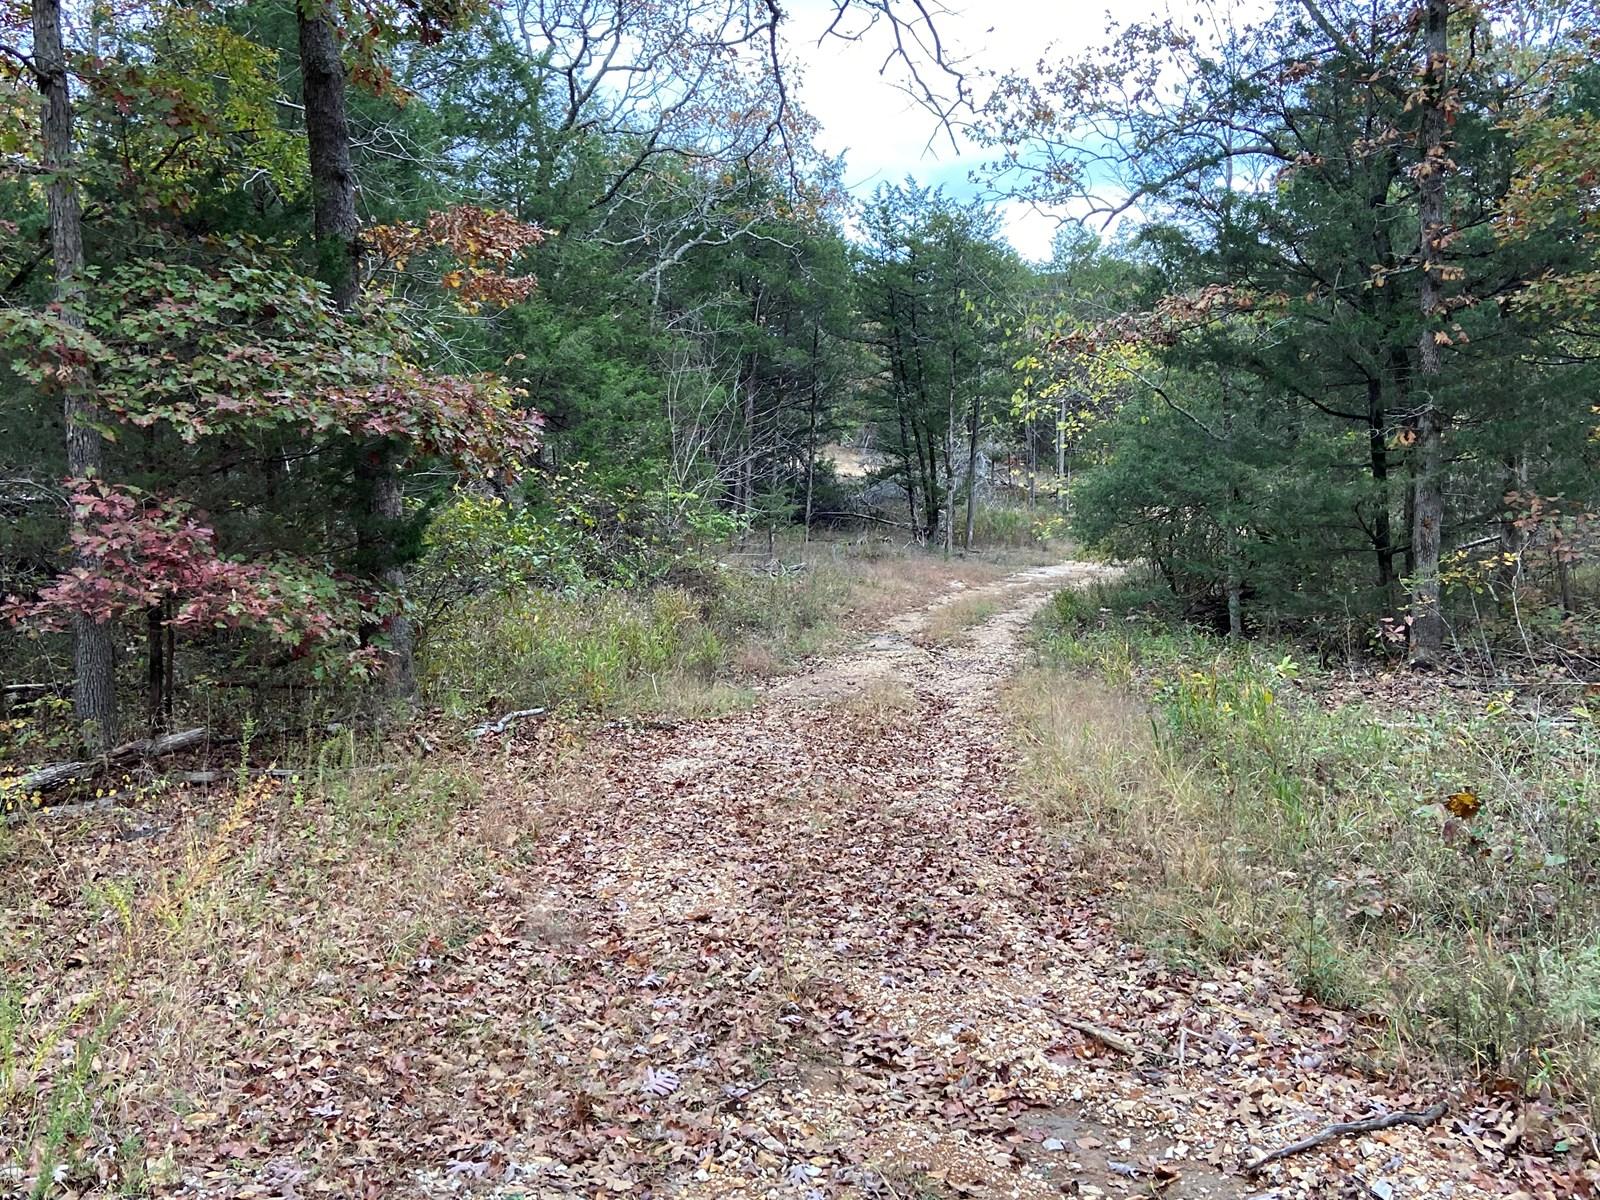 Arkansas Recreational property Hunting Land 11 acres woods